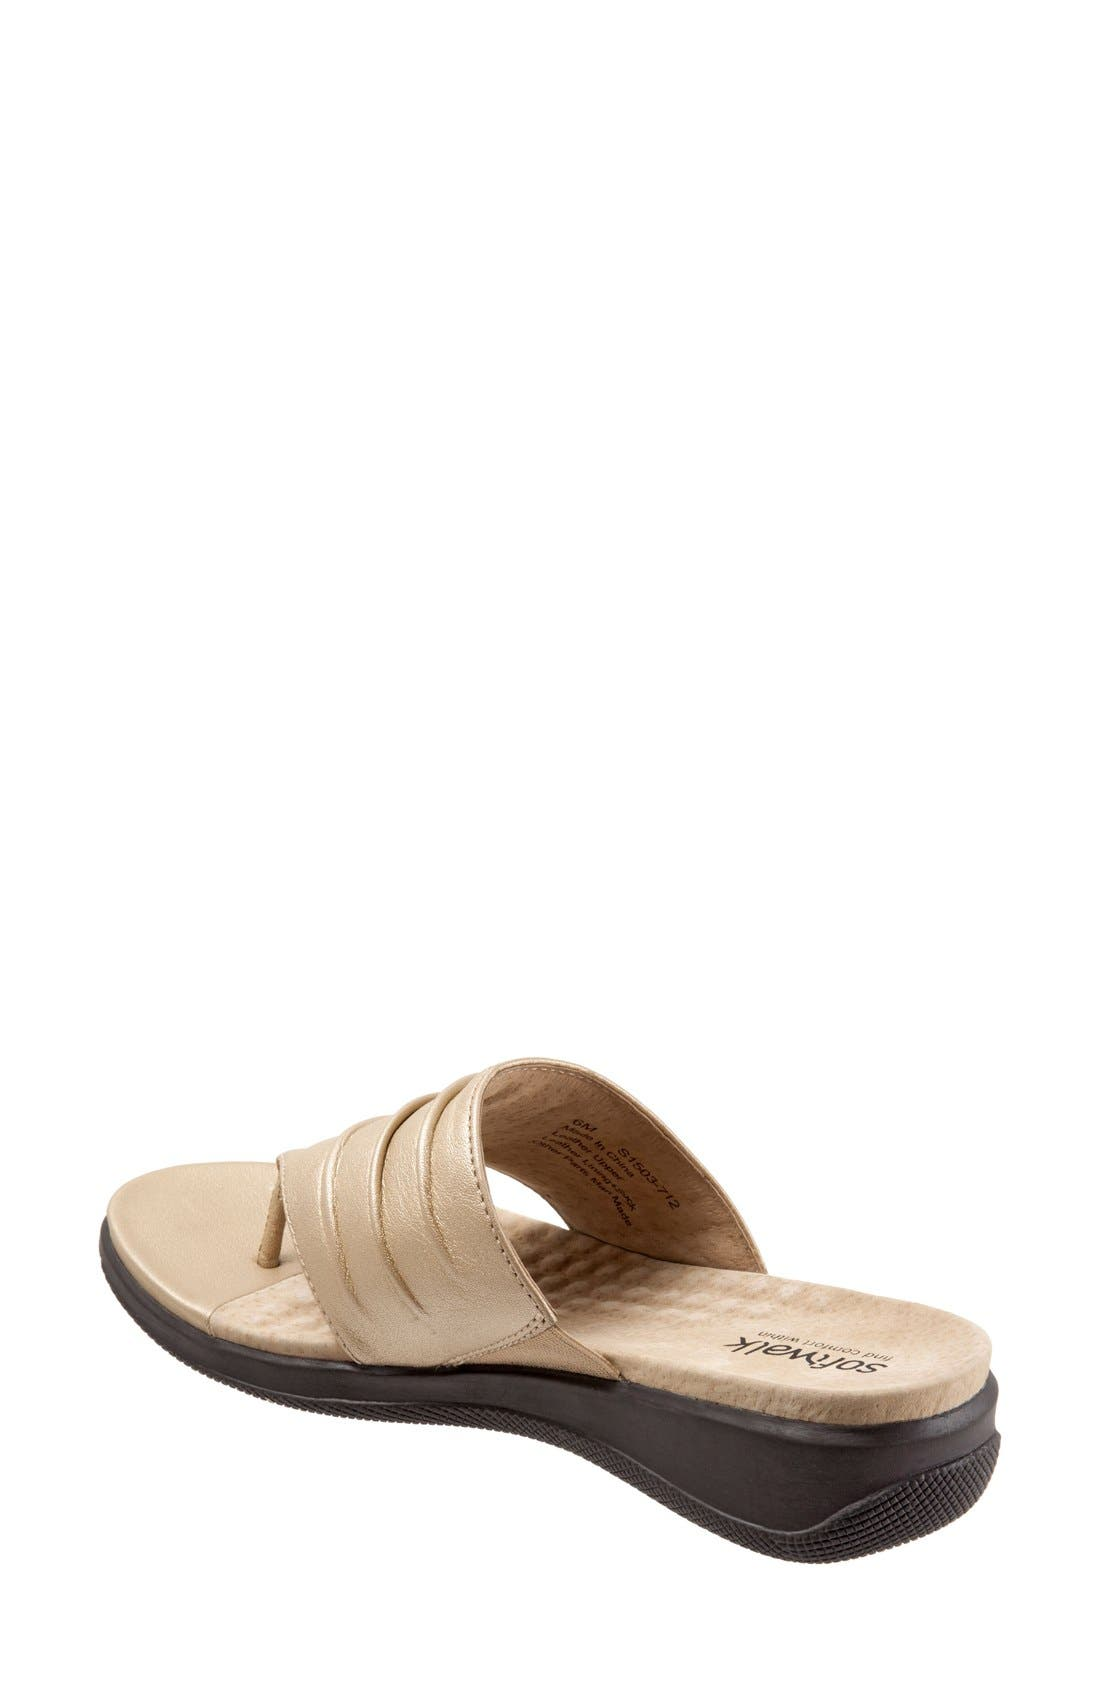 'Toma' Thong Sandal,                             Alternate thumbnail 16, color,